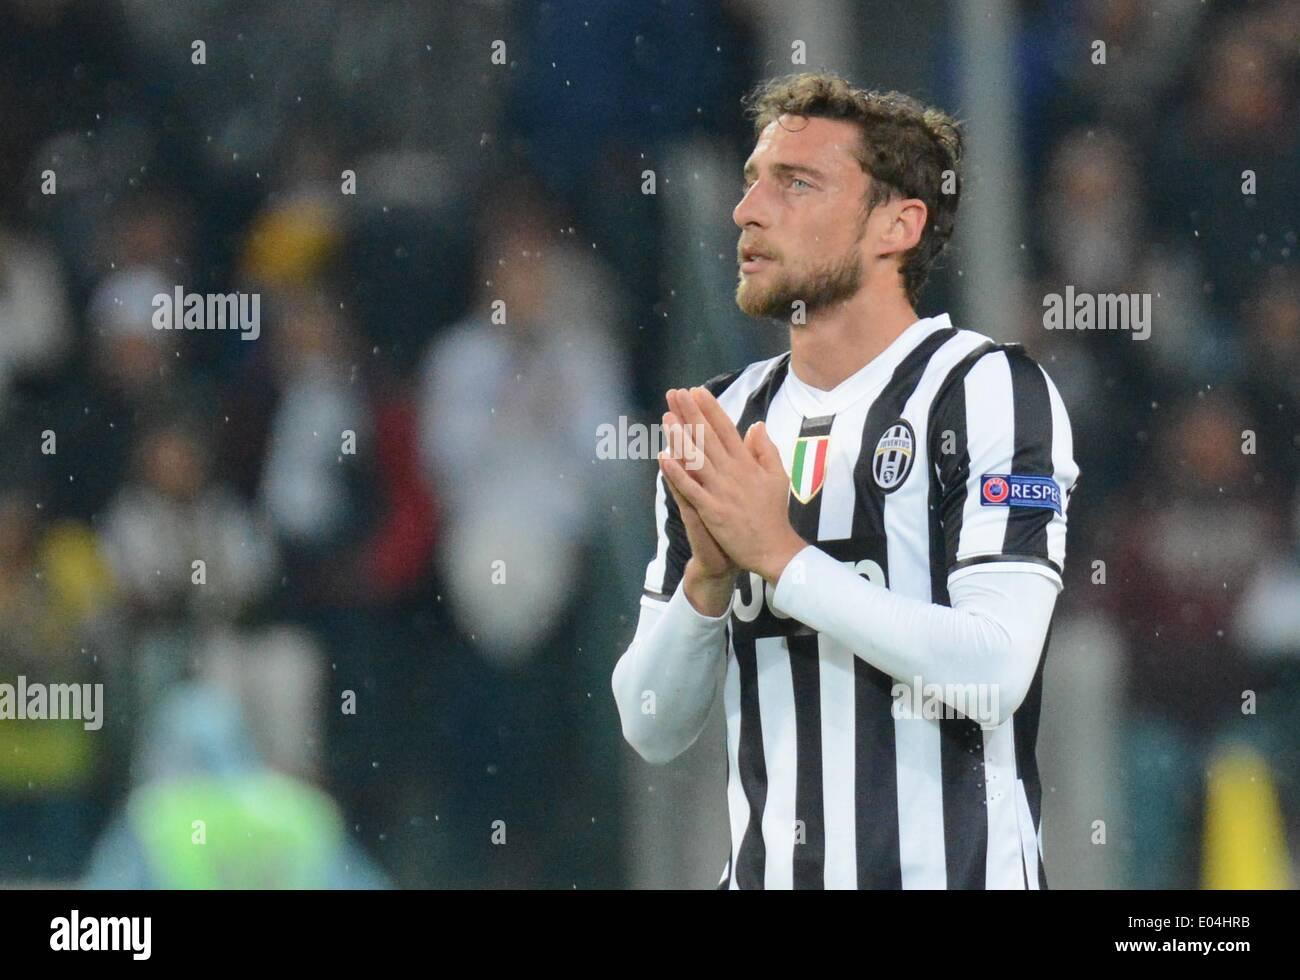 9b7a4943f96 Claudio Marchisio Stock Photos   Claudio Marchisio Stock Images ...